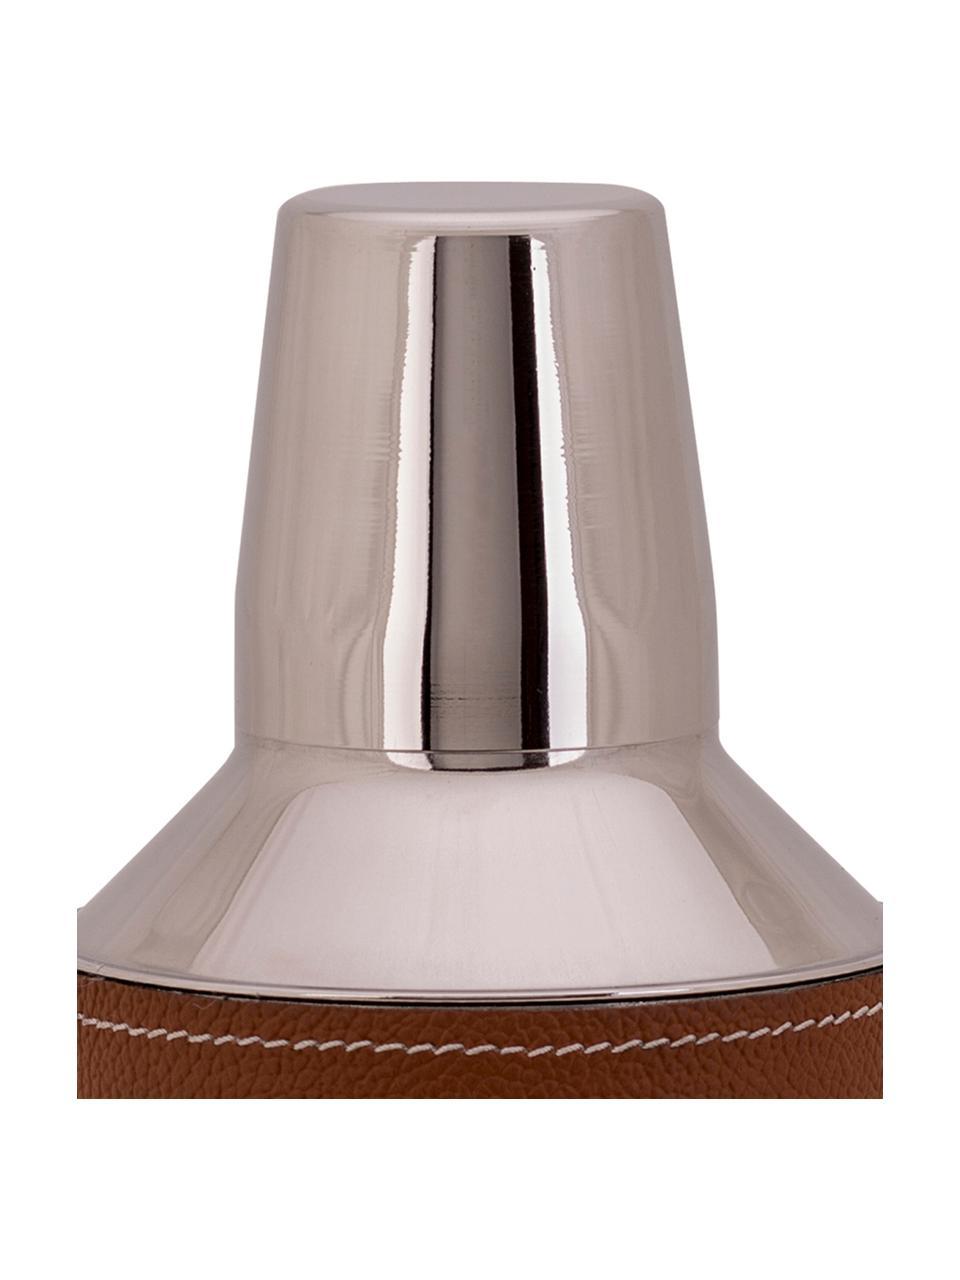 Cocktail-Shaker Lahore in Silber mit braunem Leder, Shaker: Rostfreier Stahl, Bezug: Leder, Braun, Stahl, Ø 9 x H 25 cm